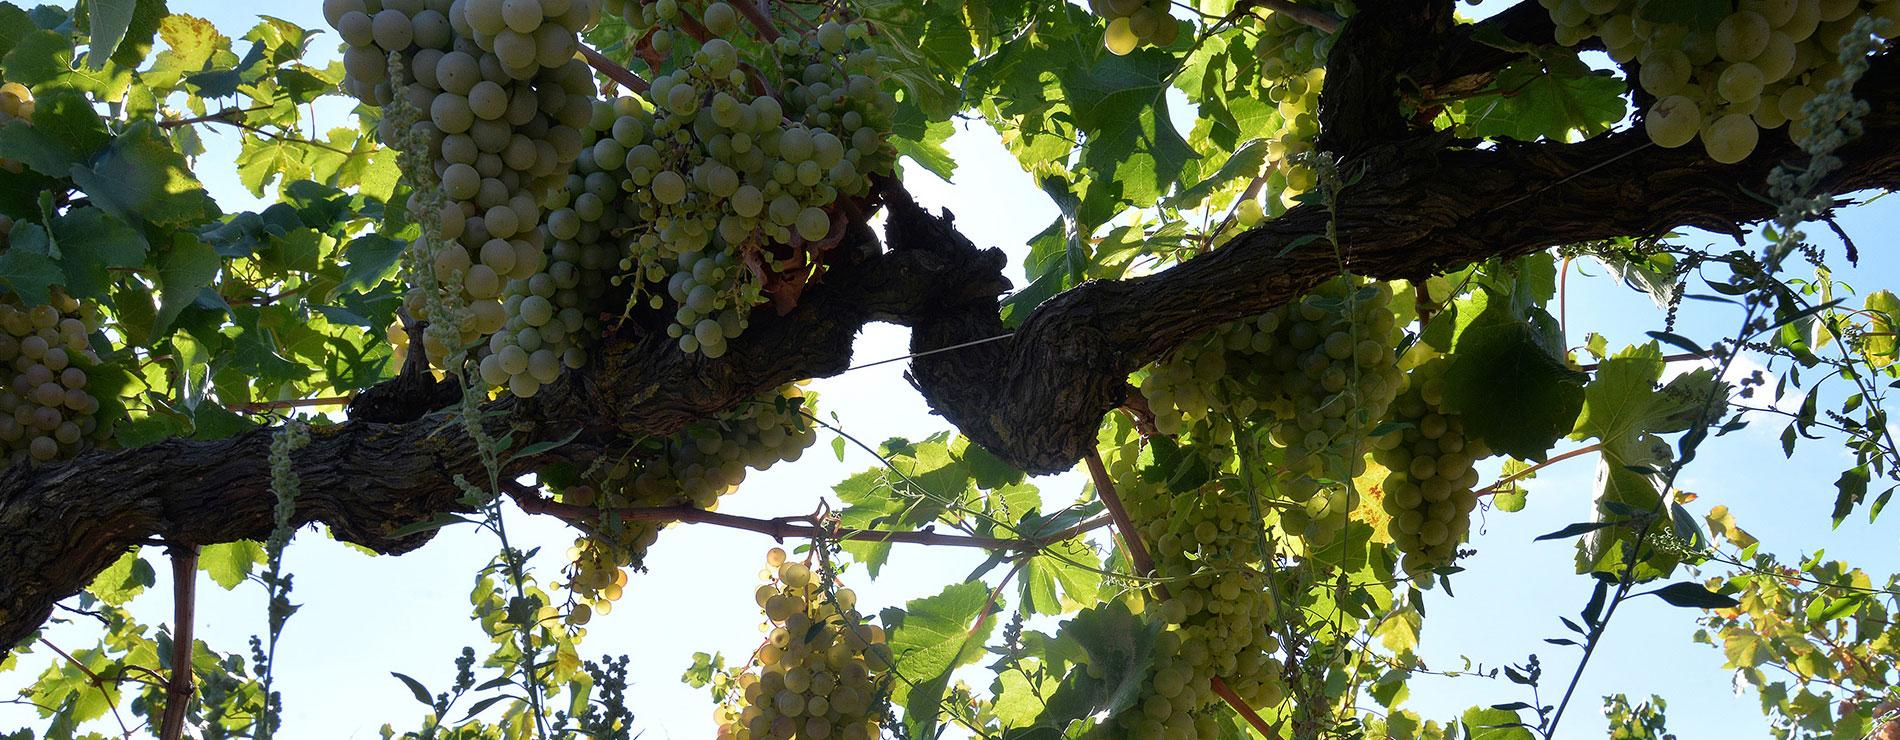 Vineyard banner